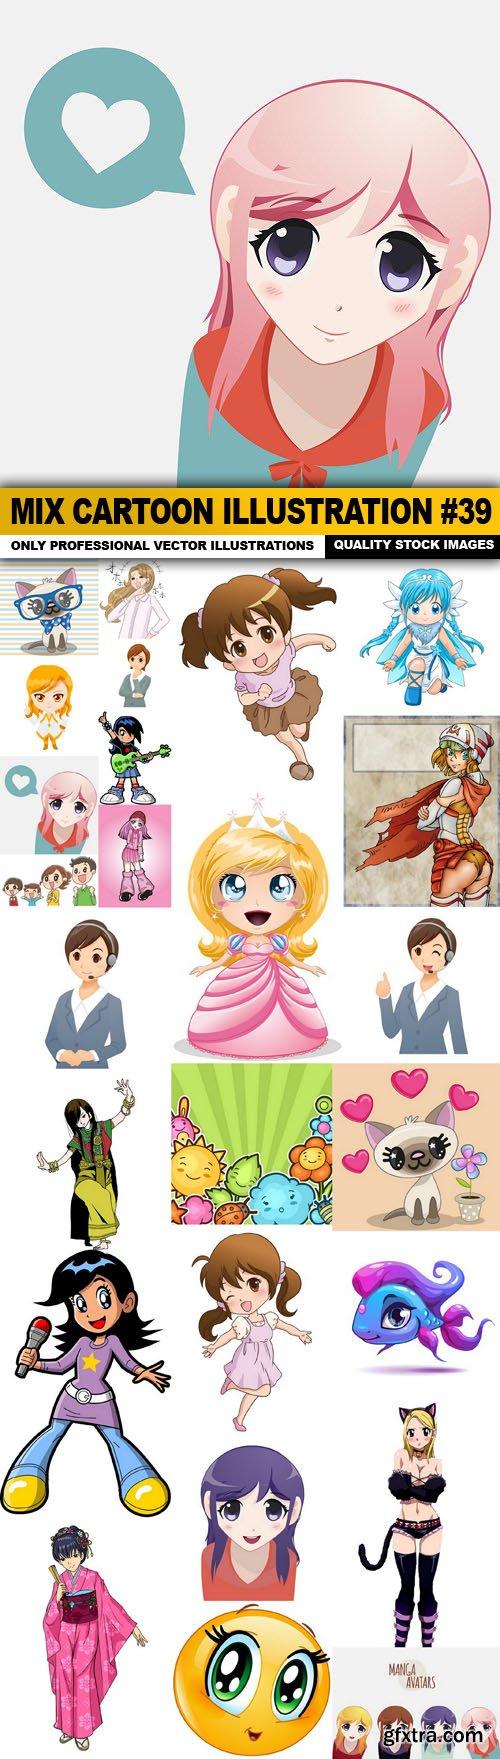 Mix cartoon Illustration #39 - 25 Vector